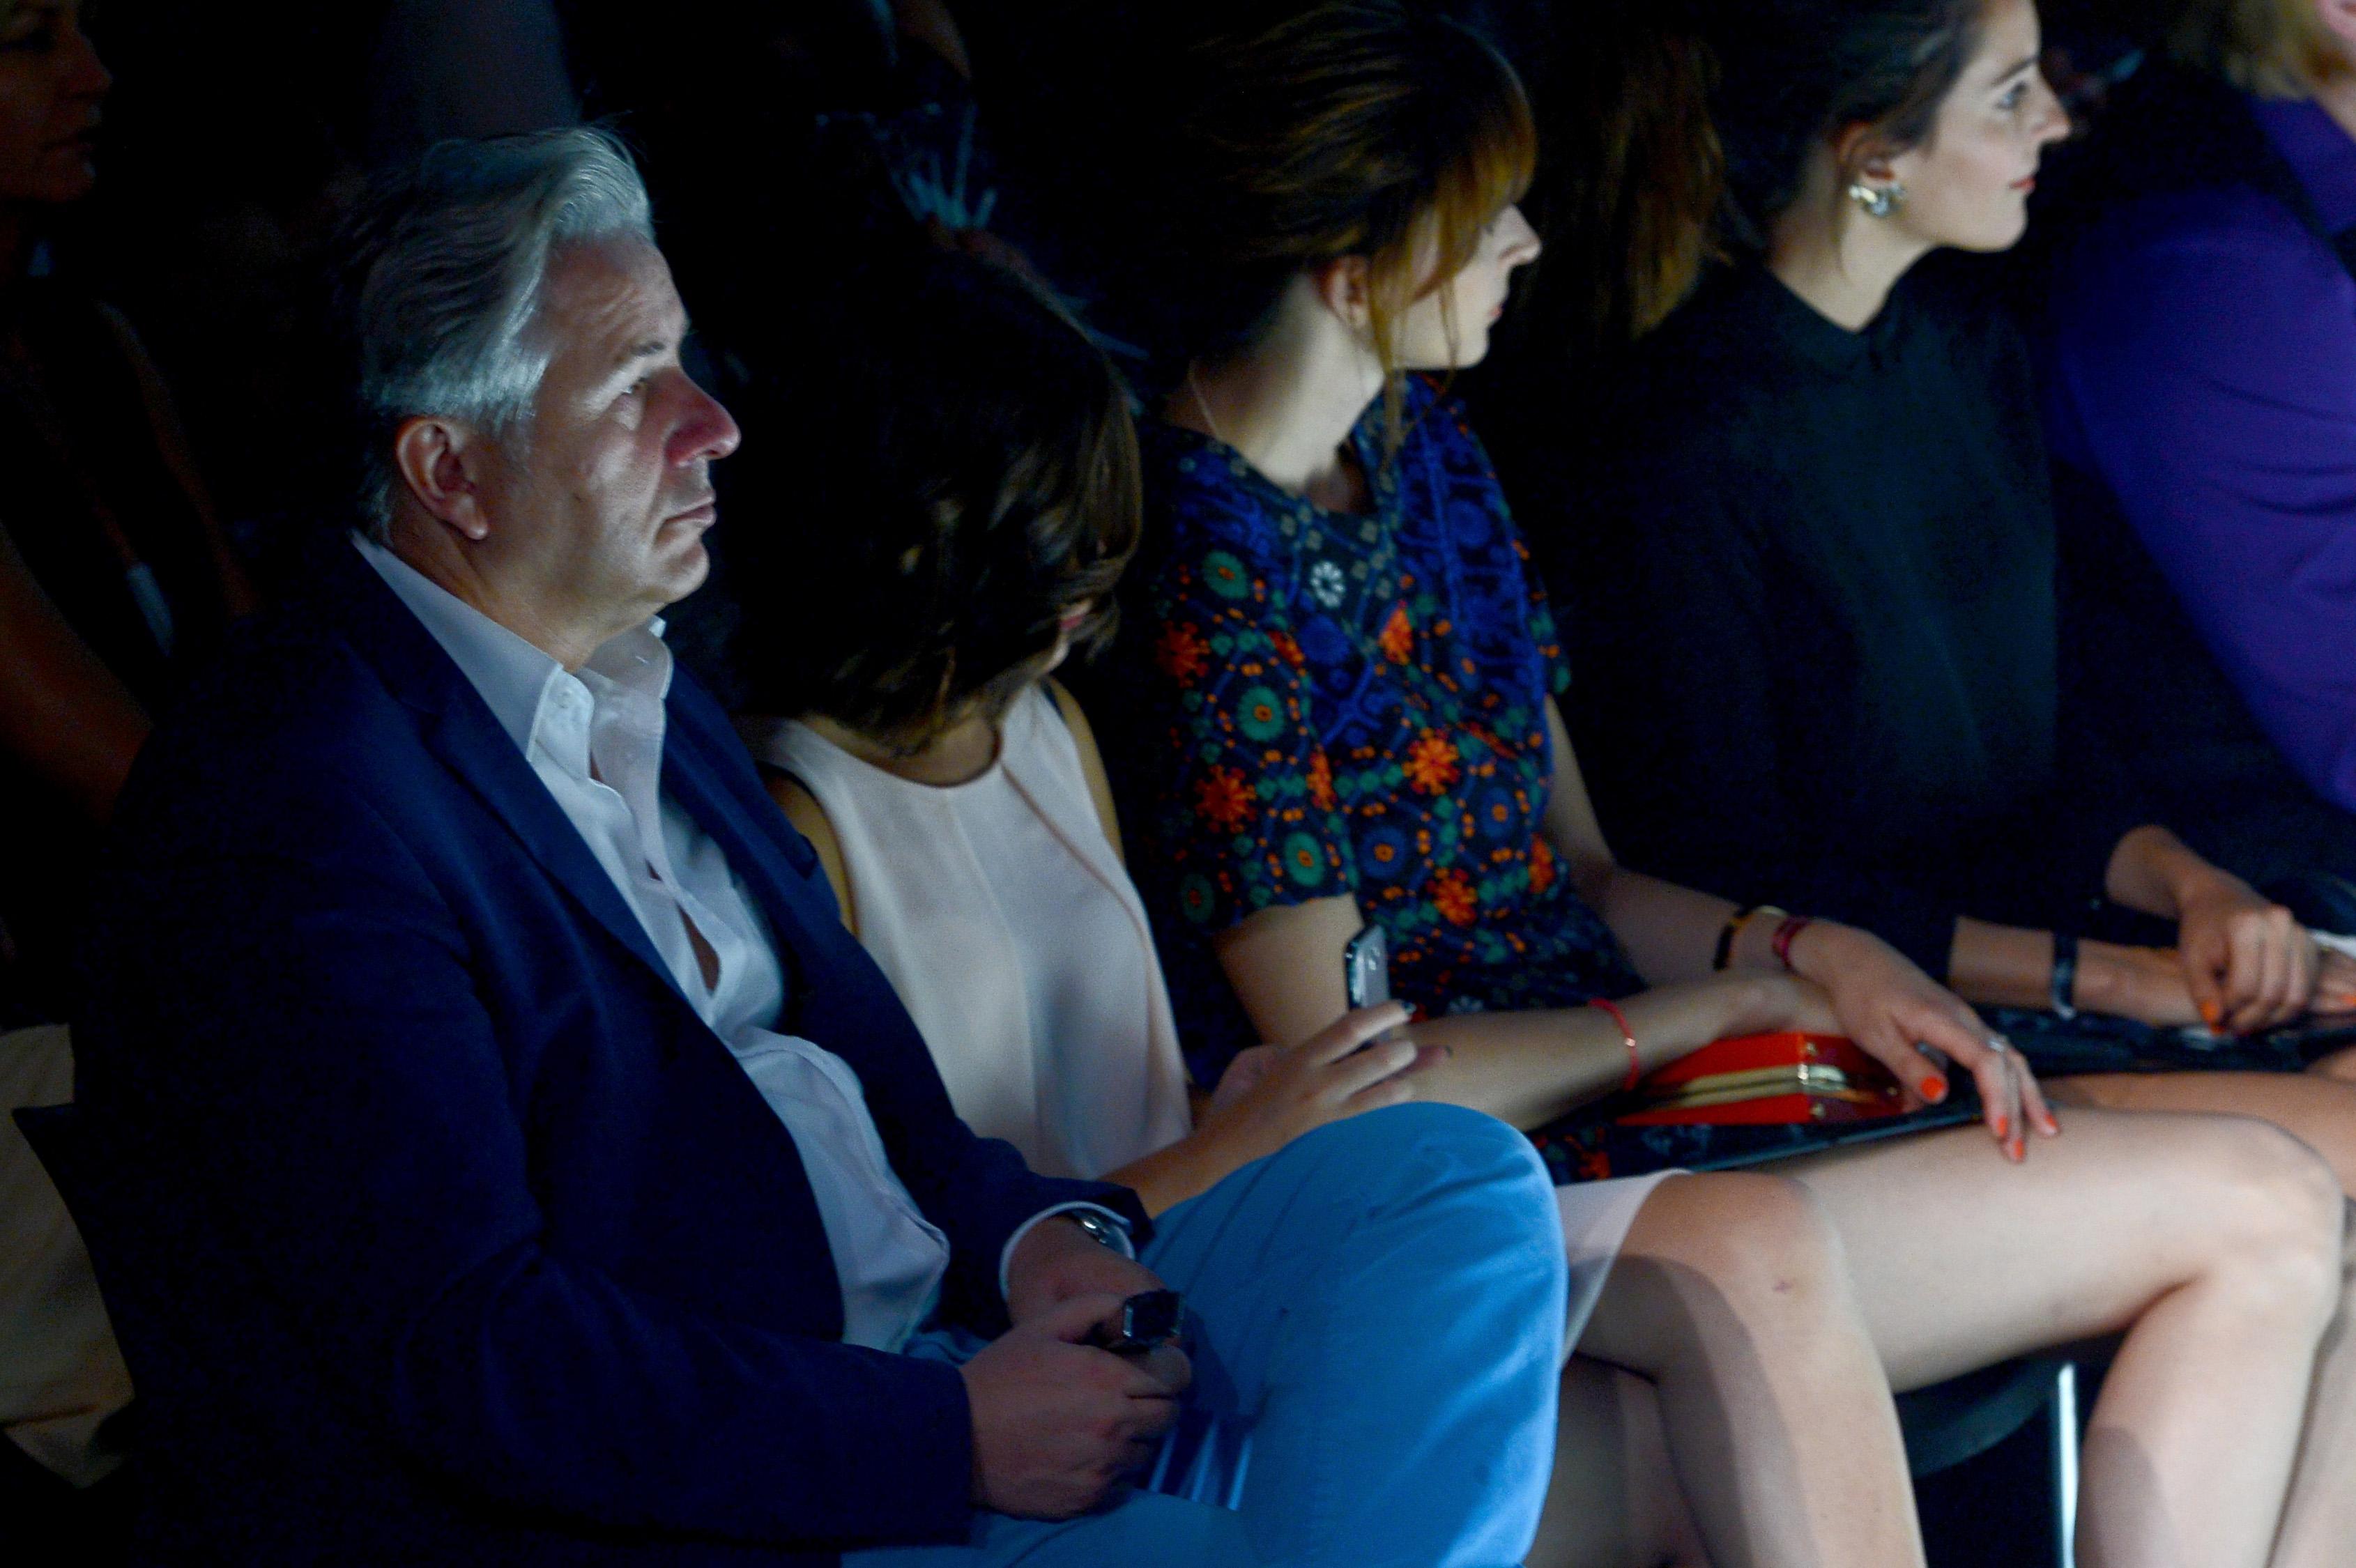 BERLIN, GERMANY - JULY 11:  Klaus Wowereit enjoys the Michalsky Style Night at Tempodrom on July 11, 2014 in Berlin, Germany.